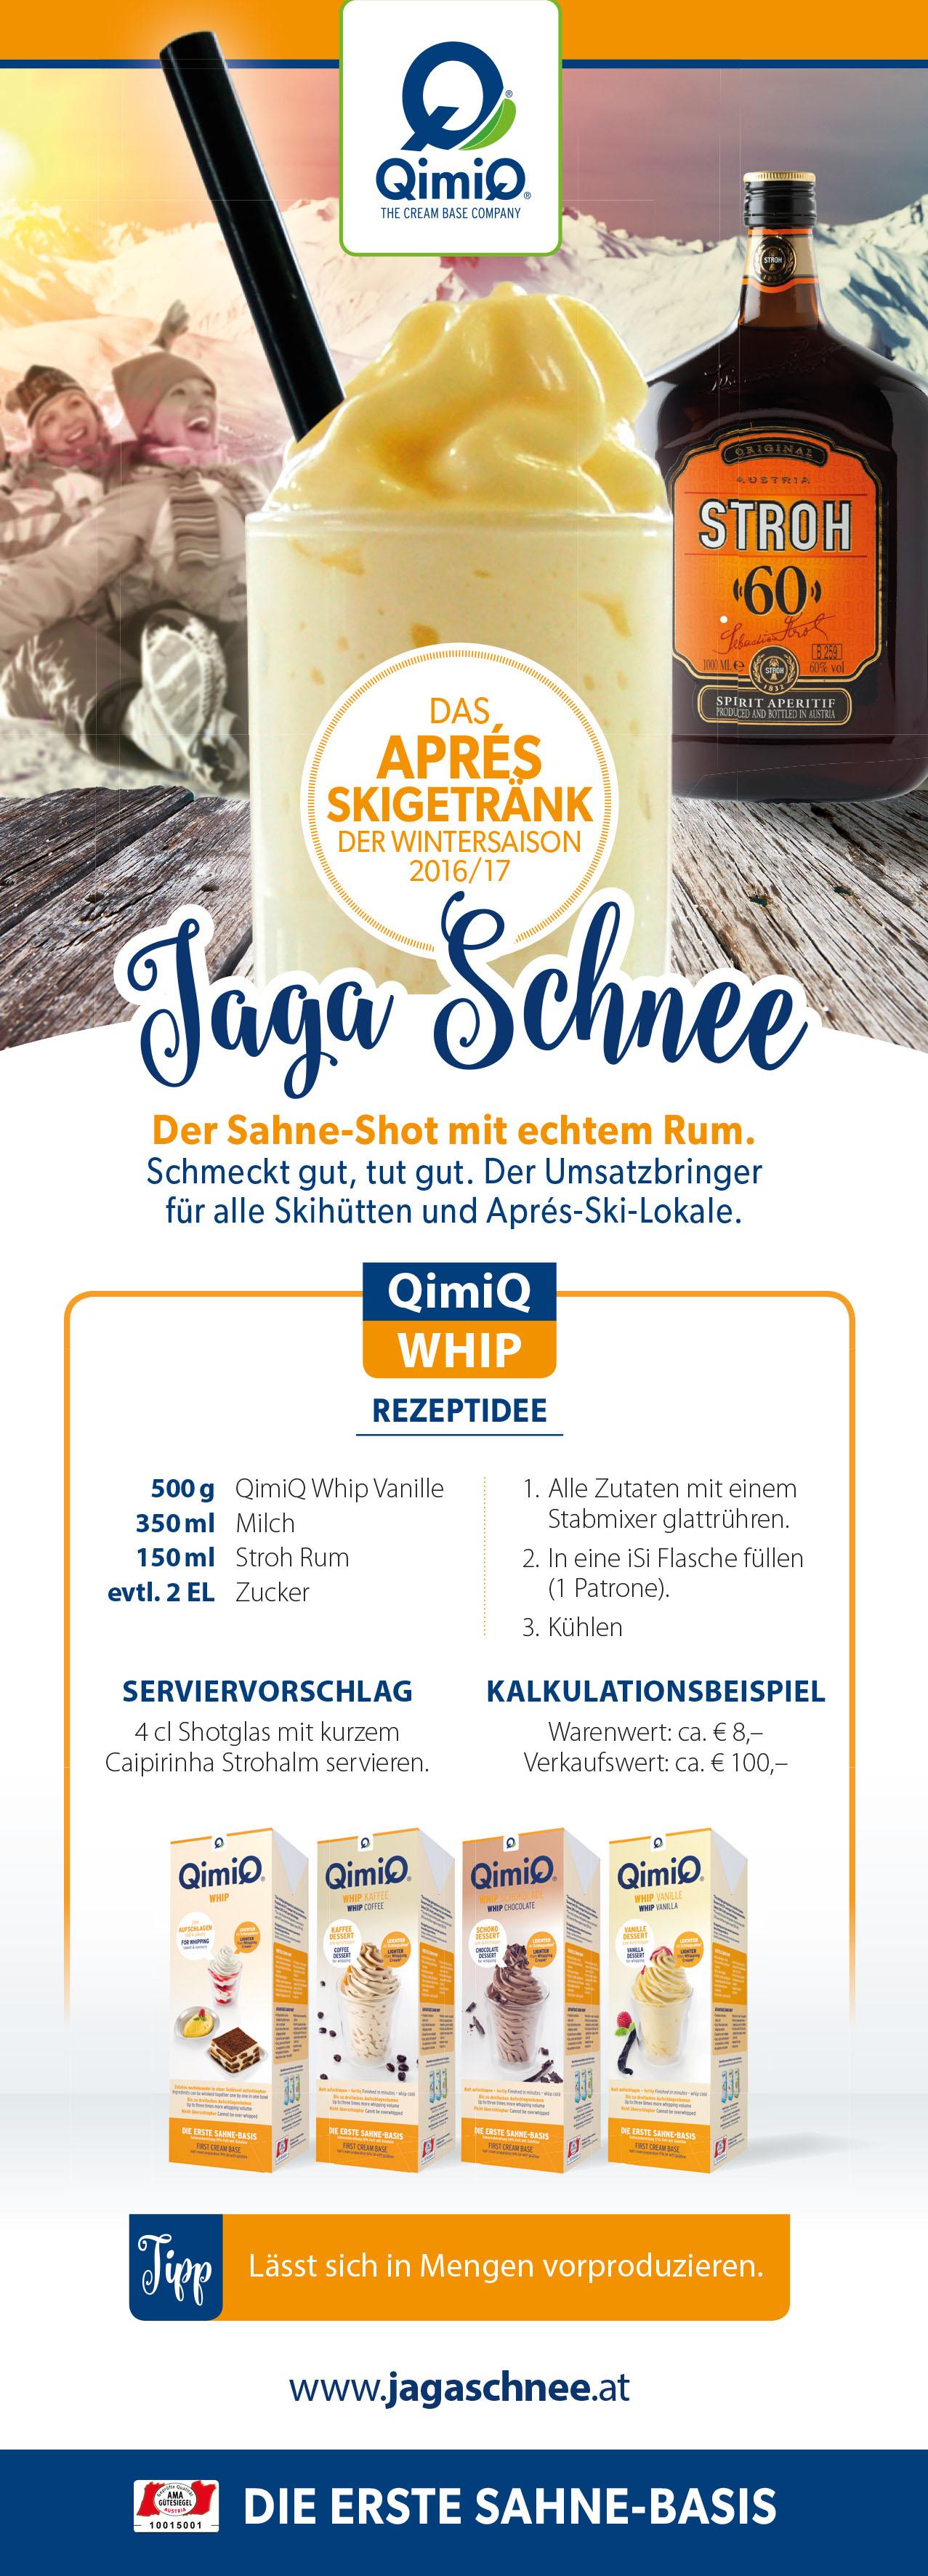 jagaschnee reklame.PNG